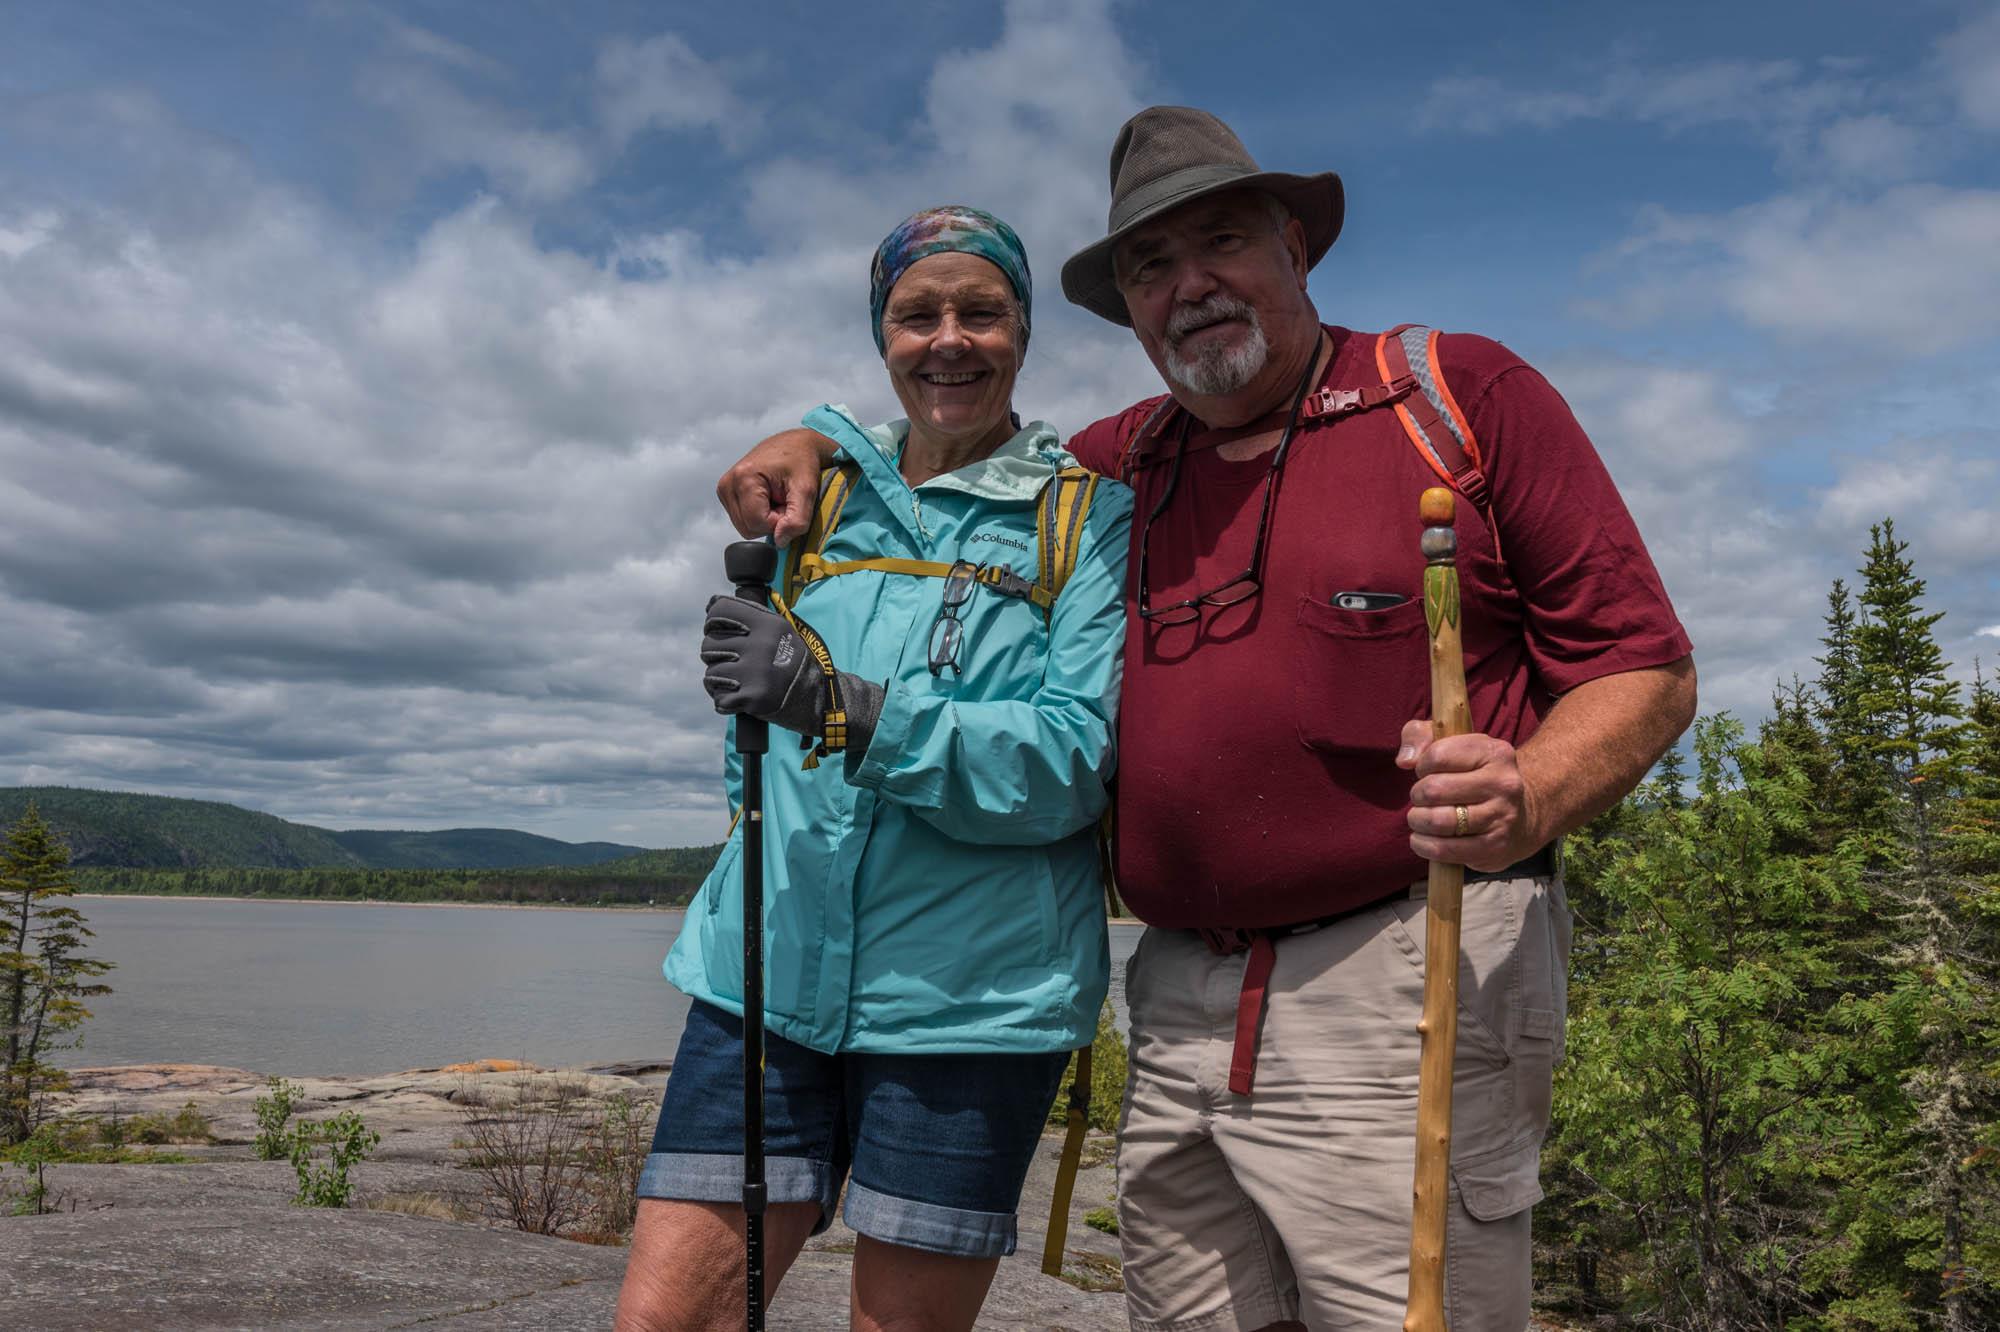 Hiking along Lake Superior